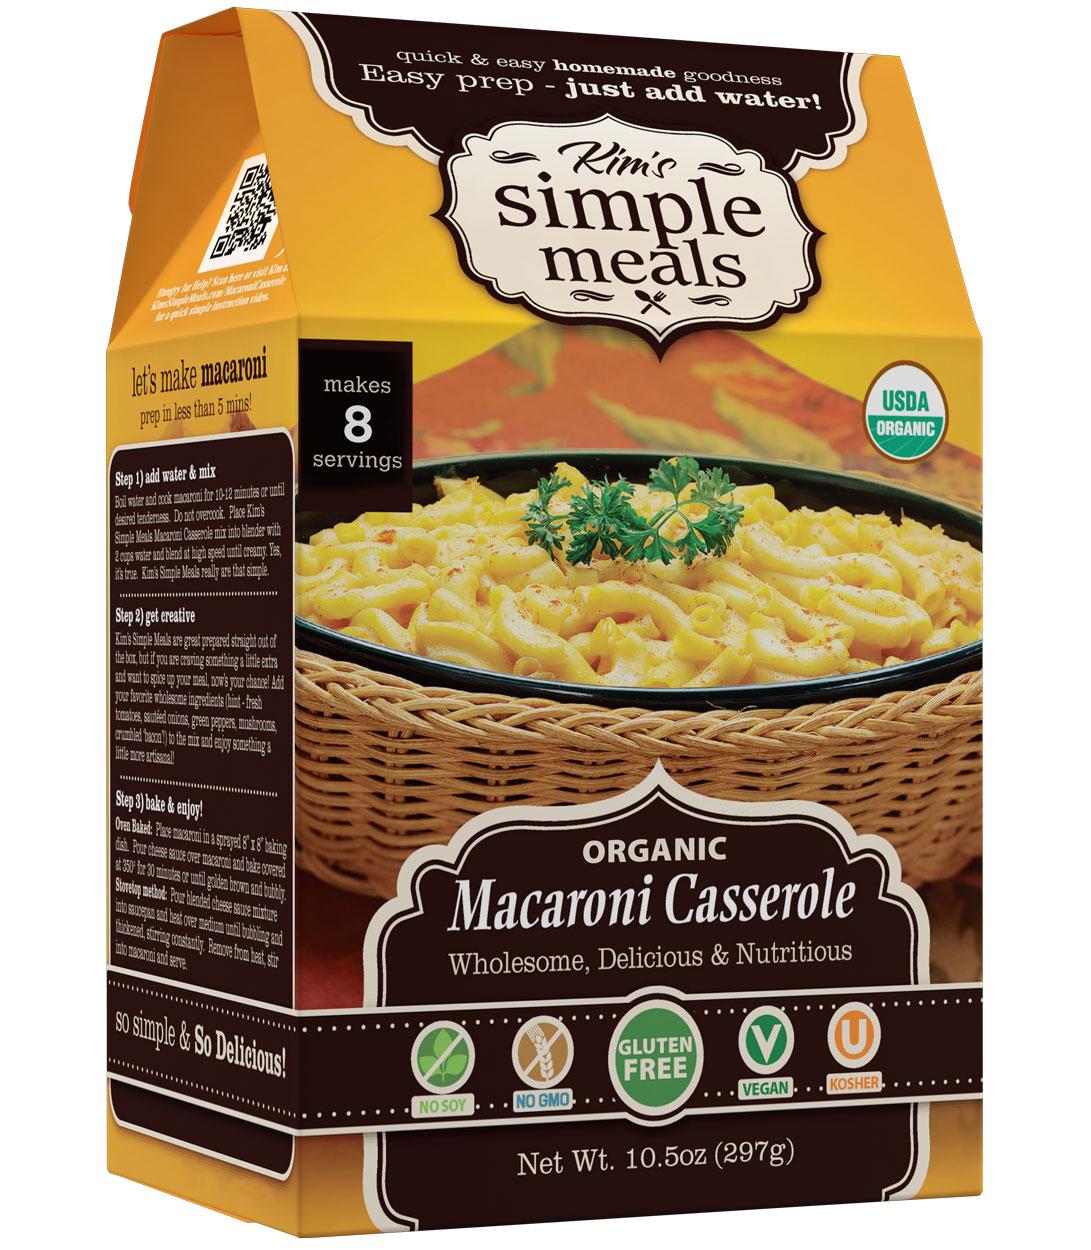 Macaroni-Casserole